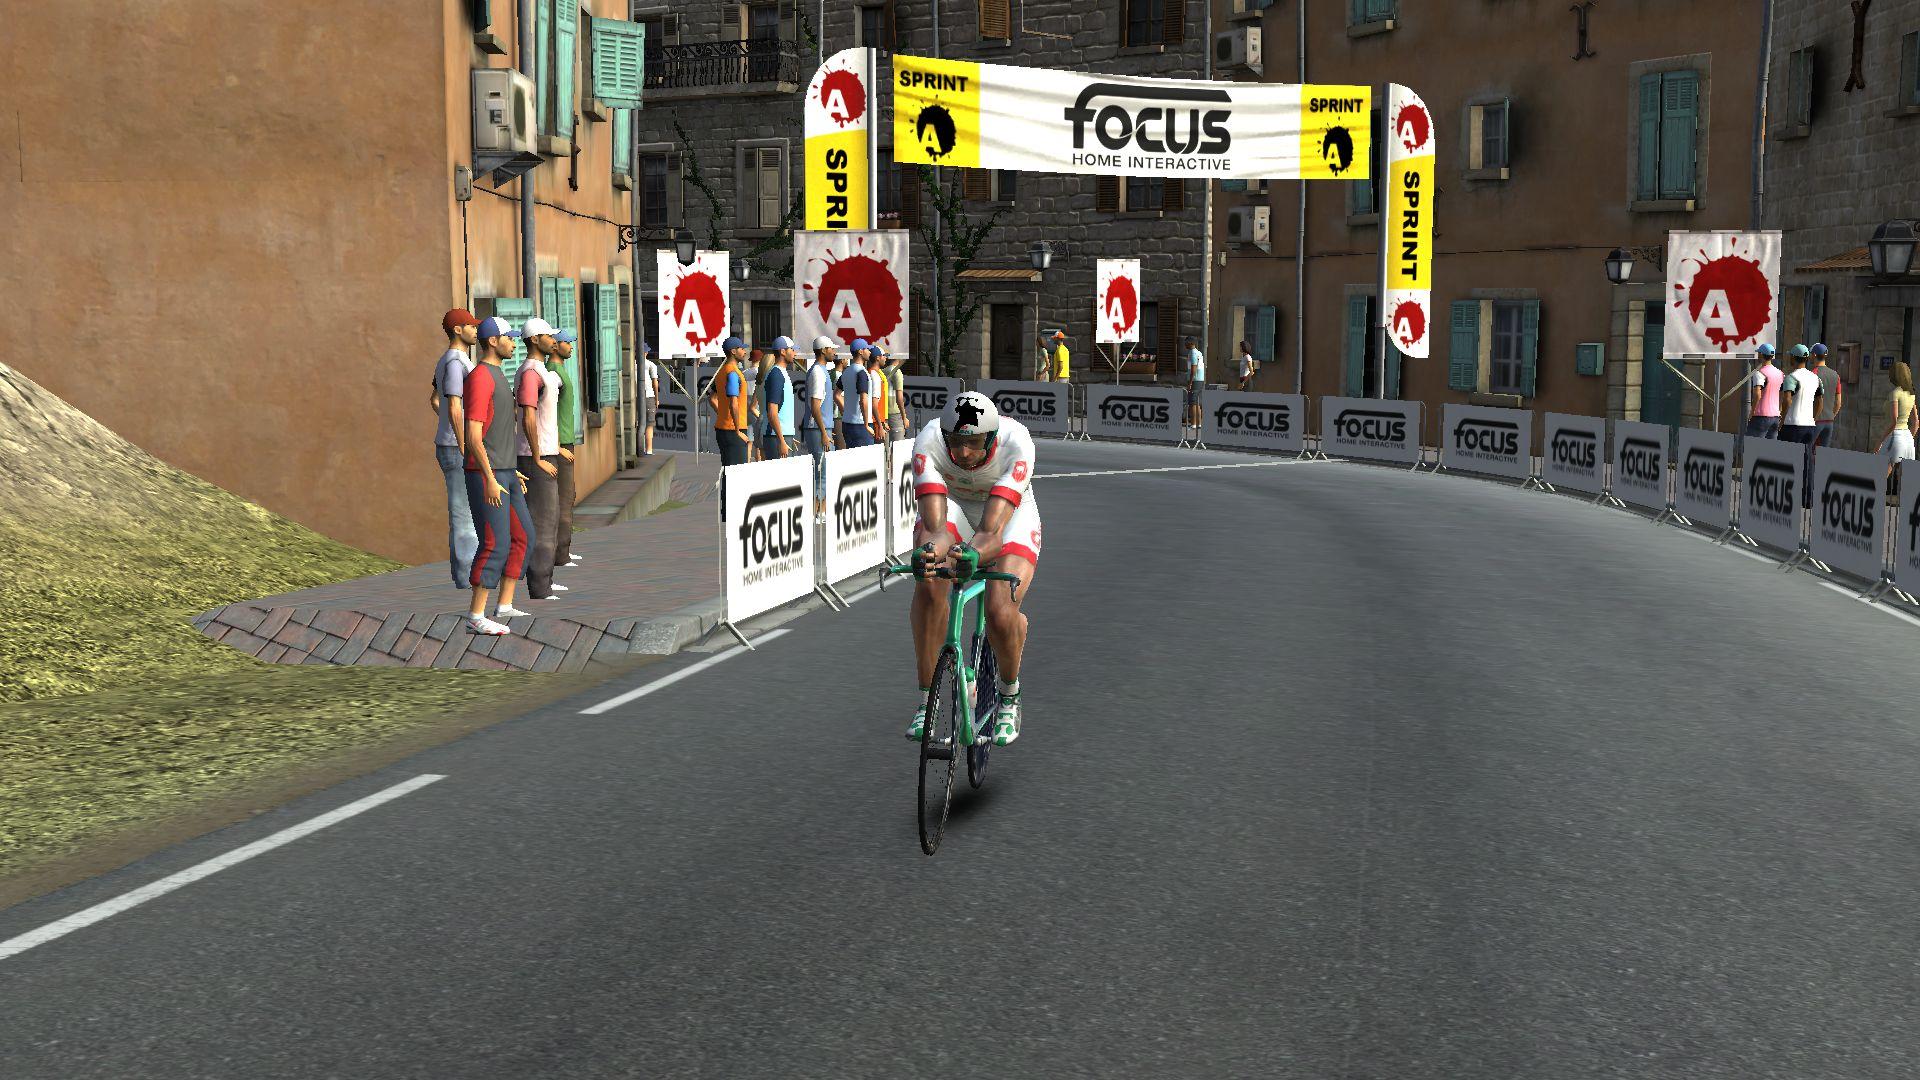 pcmdaily.com/images/mg/2019/Races/GTM/Giro/mg19_giro_09_PCM0002.jpg